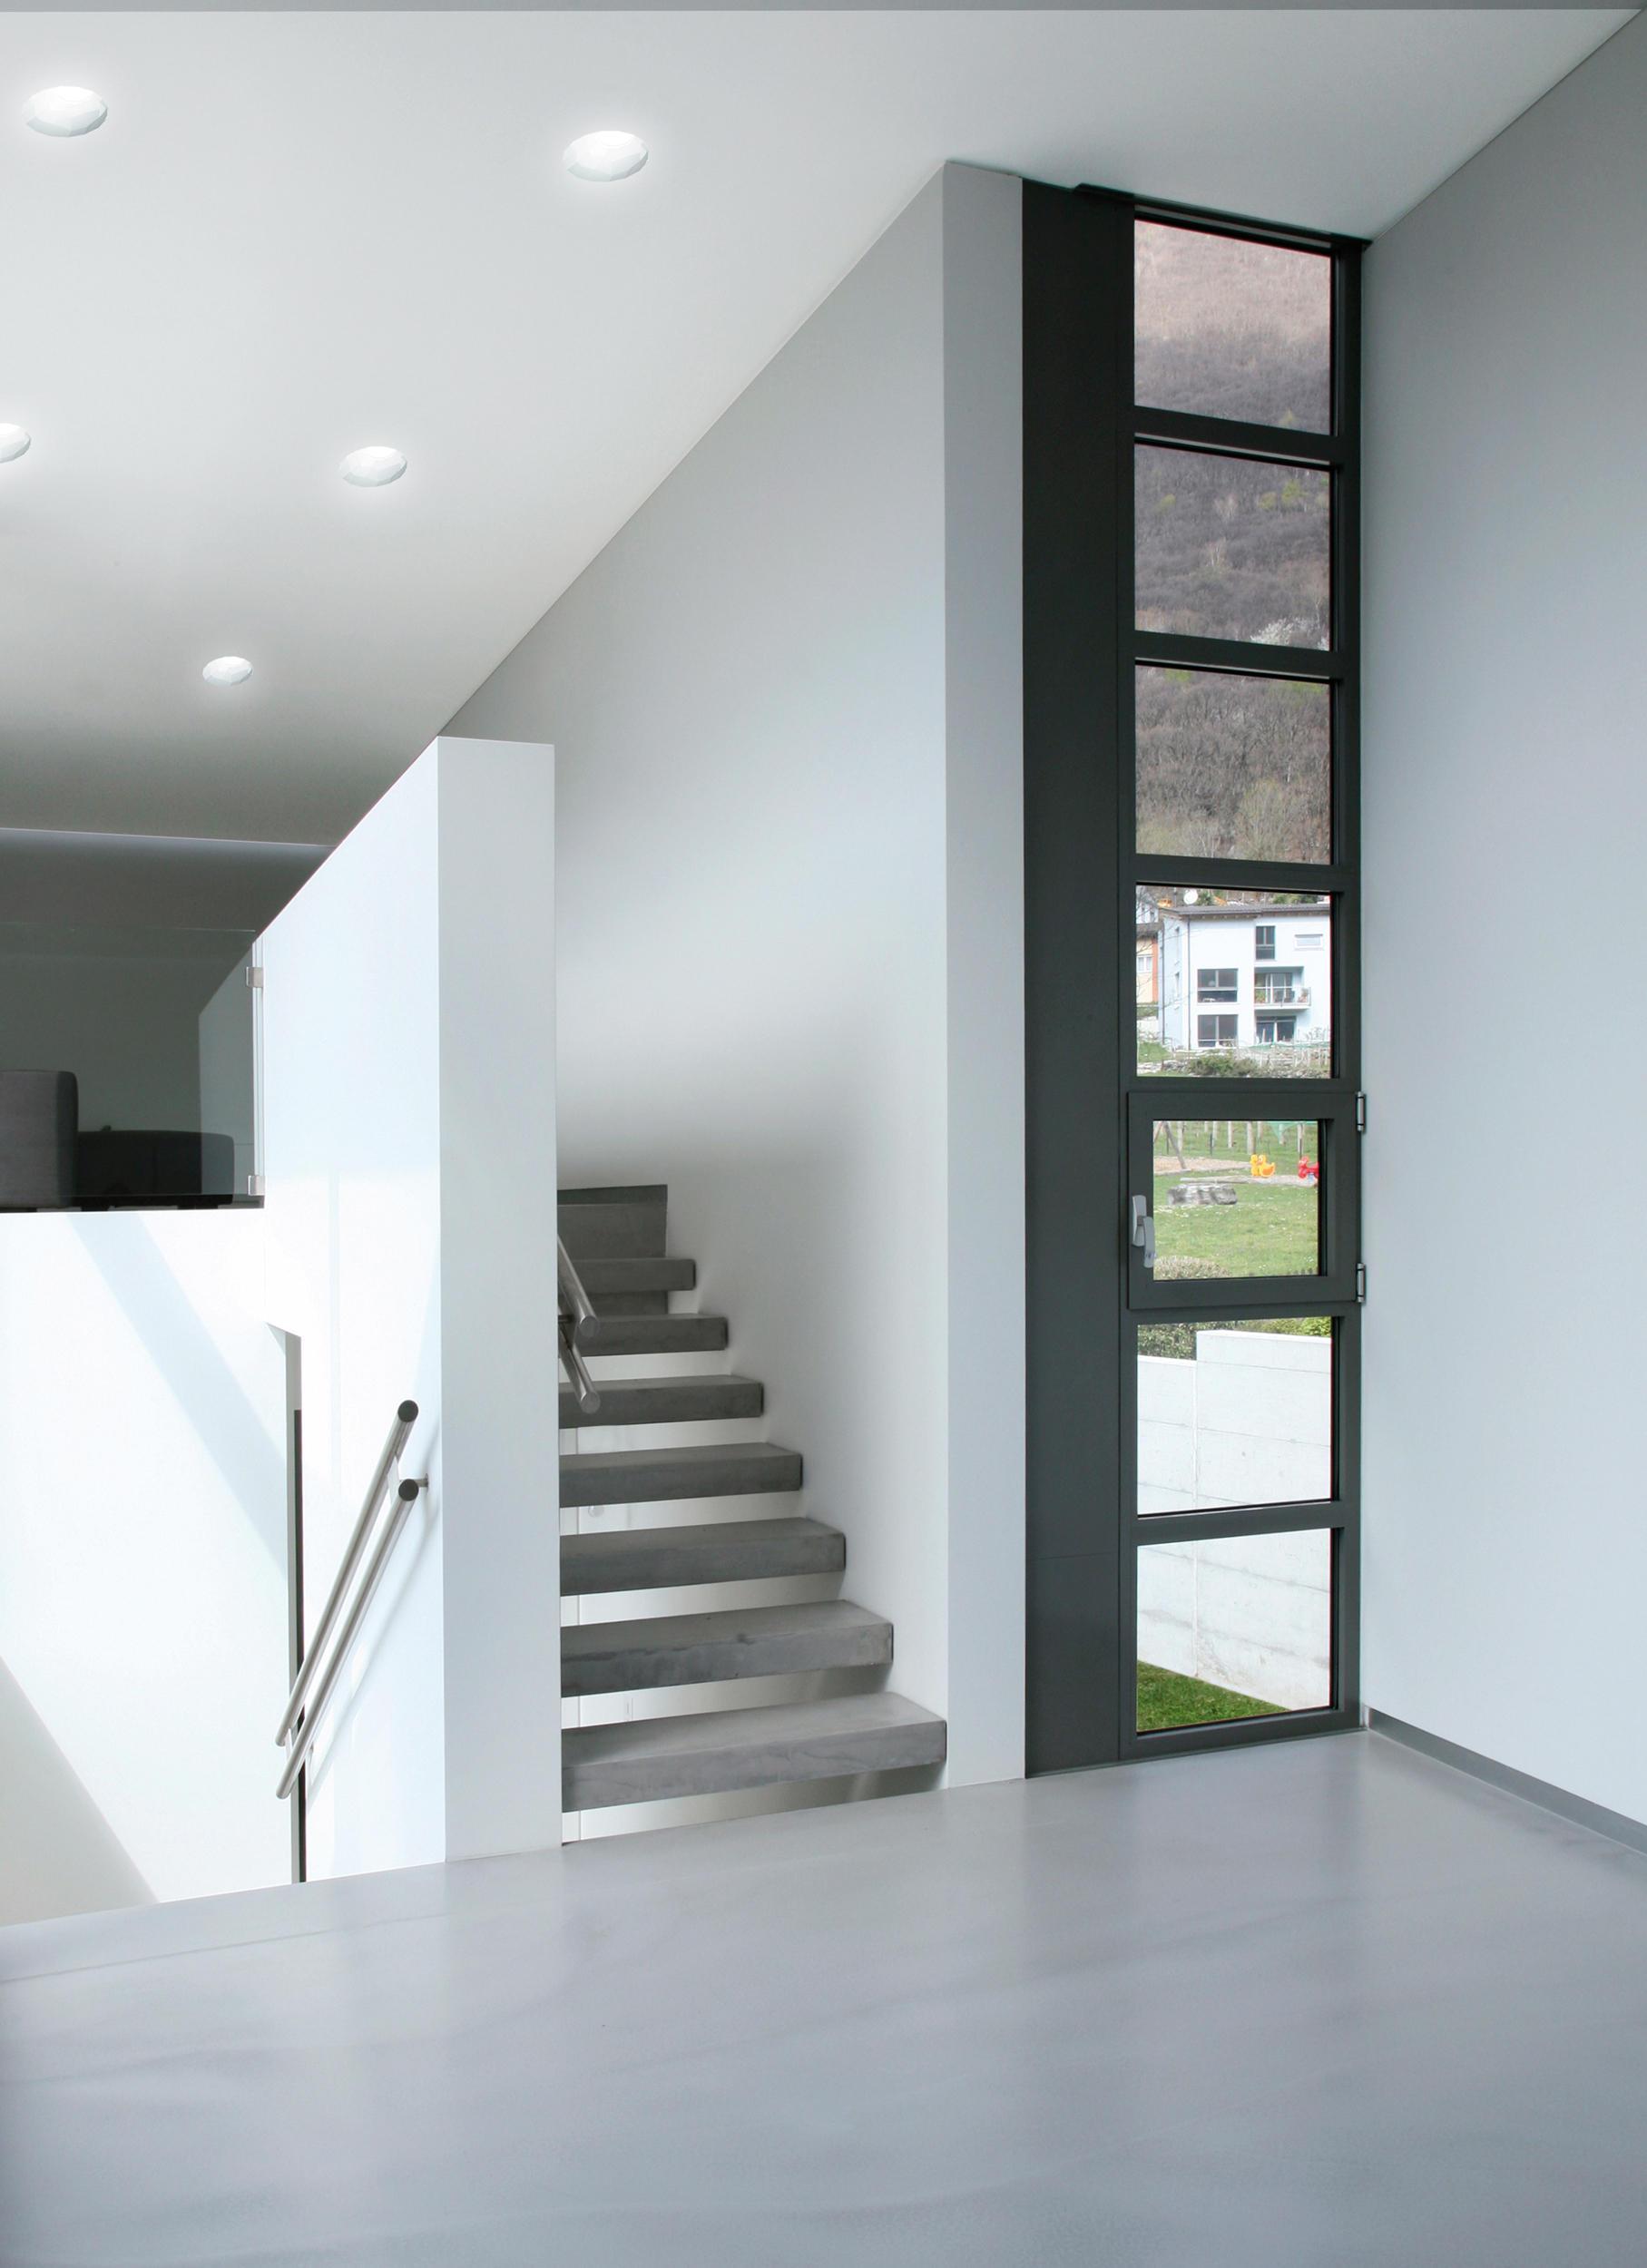 3060 haussmann general lighting from atelier sedap. Black Bedroom Furniture Sets. Home Design Ideas